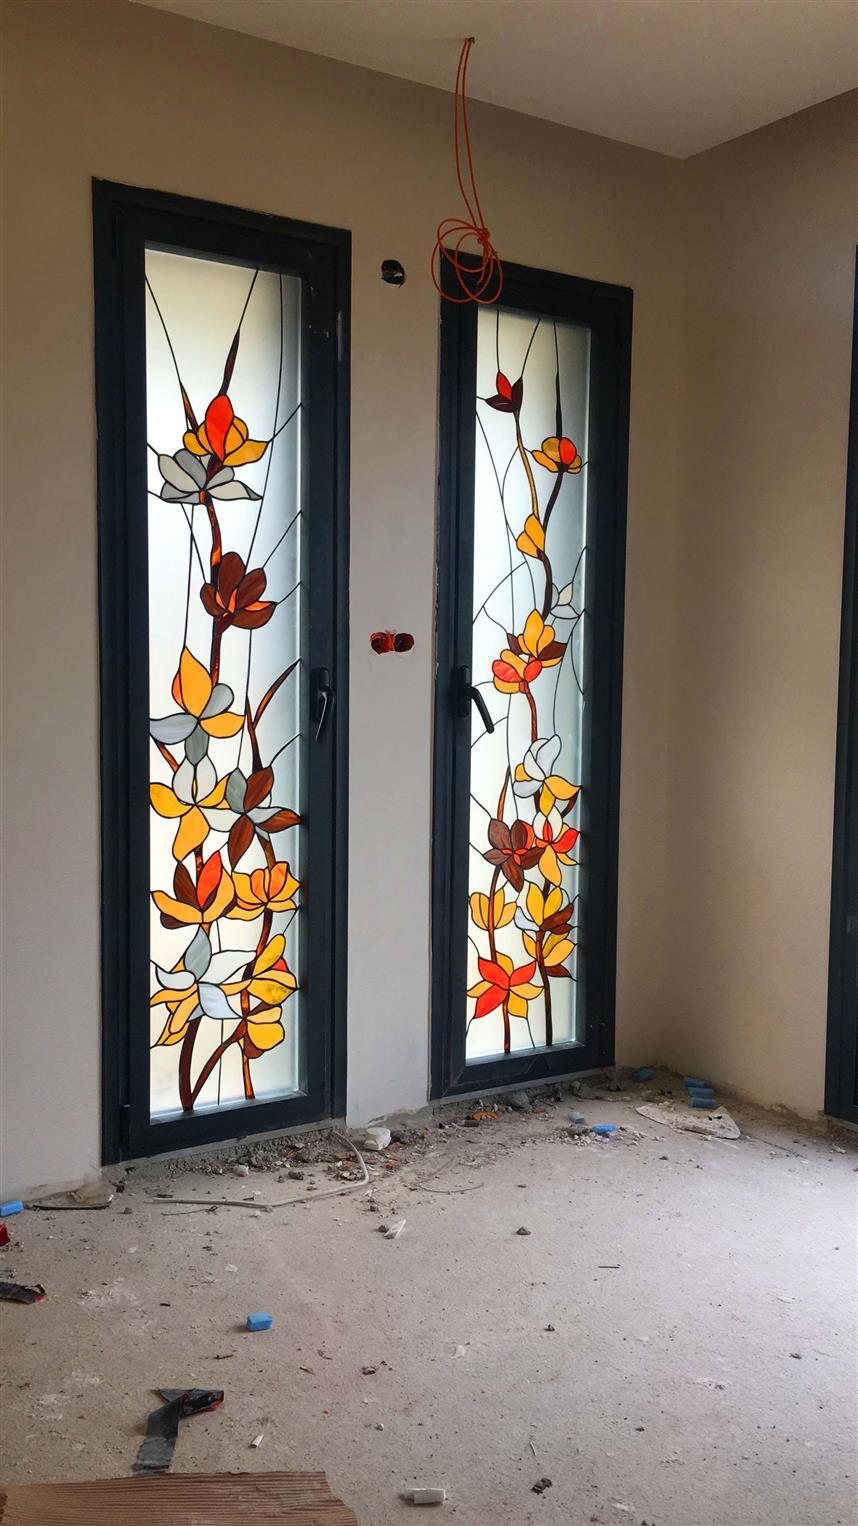 limanreis-narlidere-villa202012018214577.jpg izmir vitray çalışması